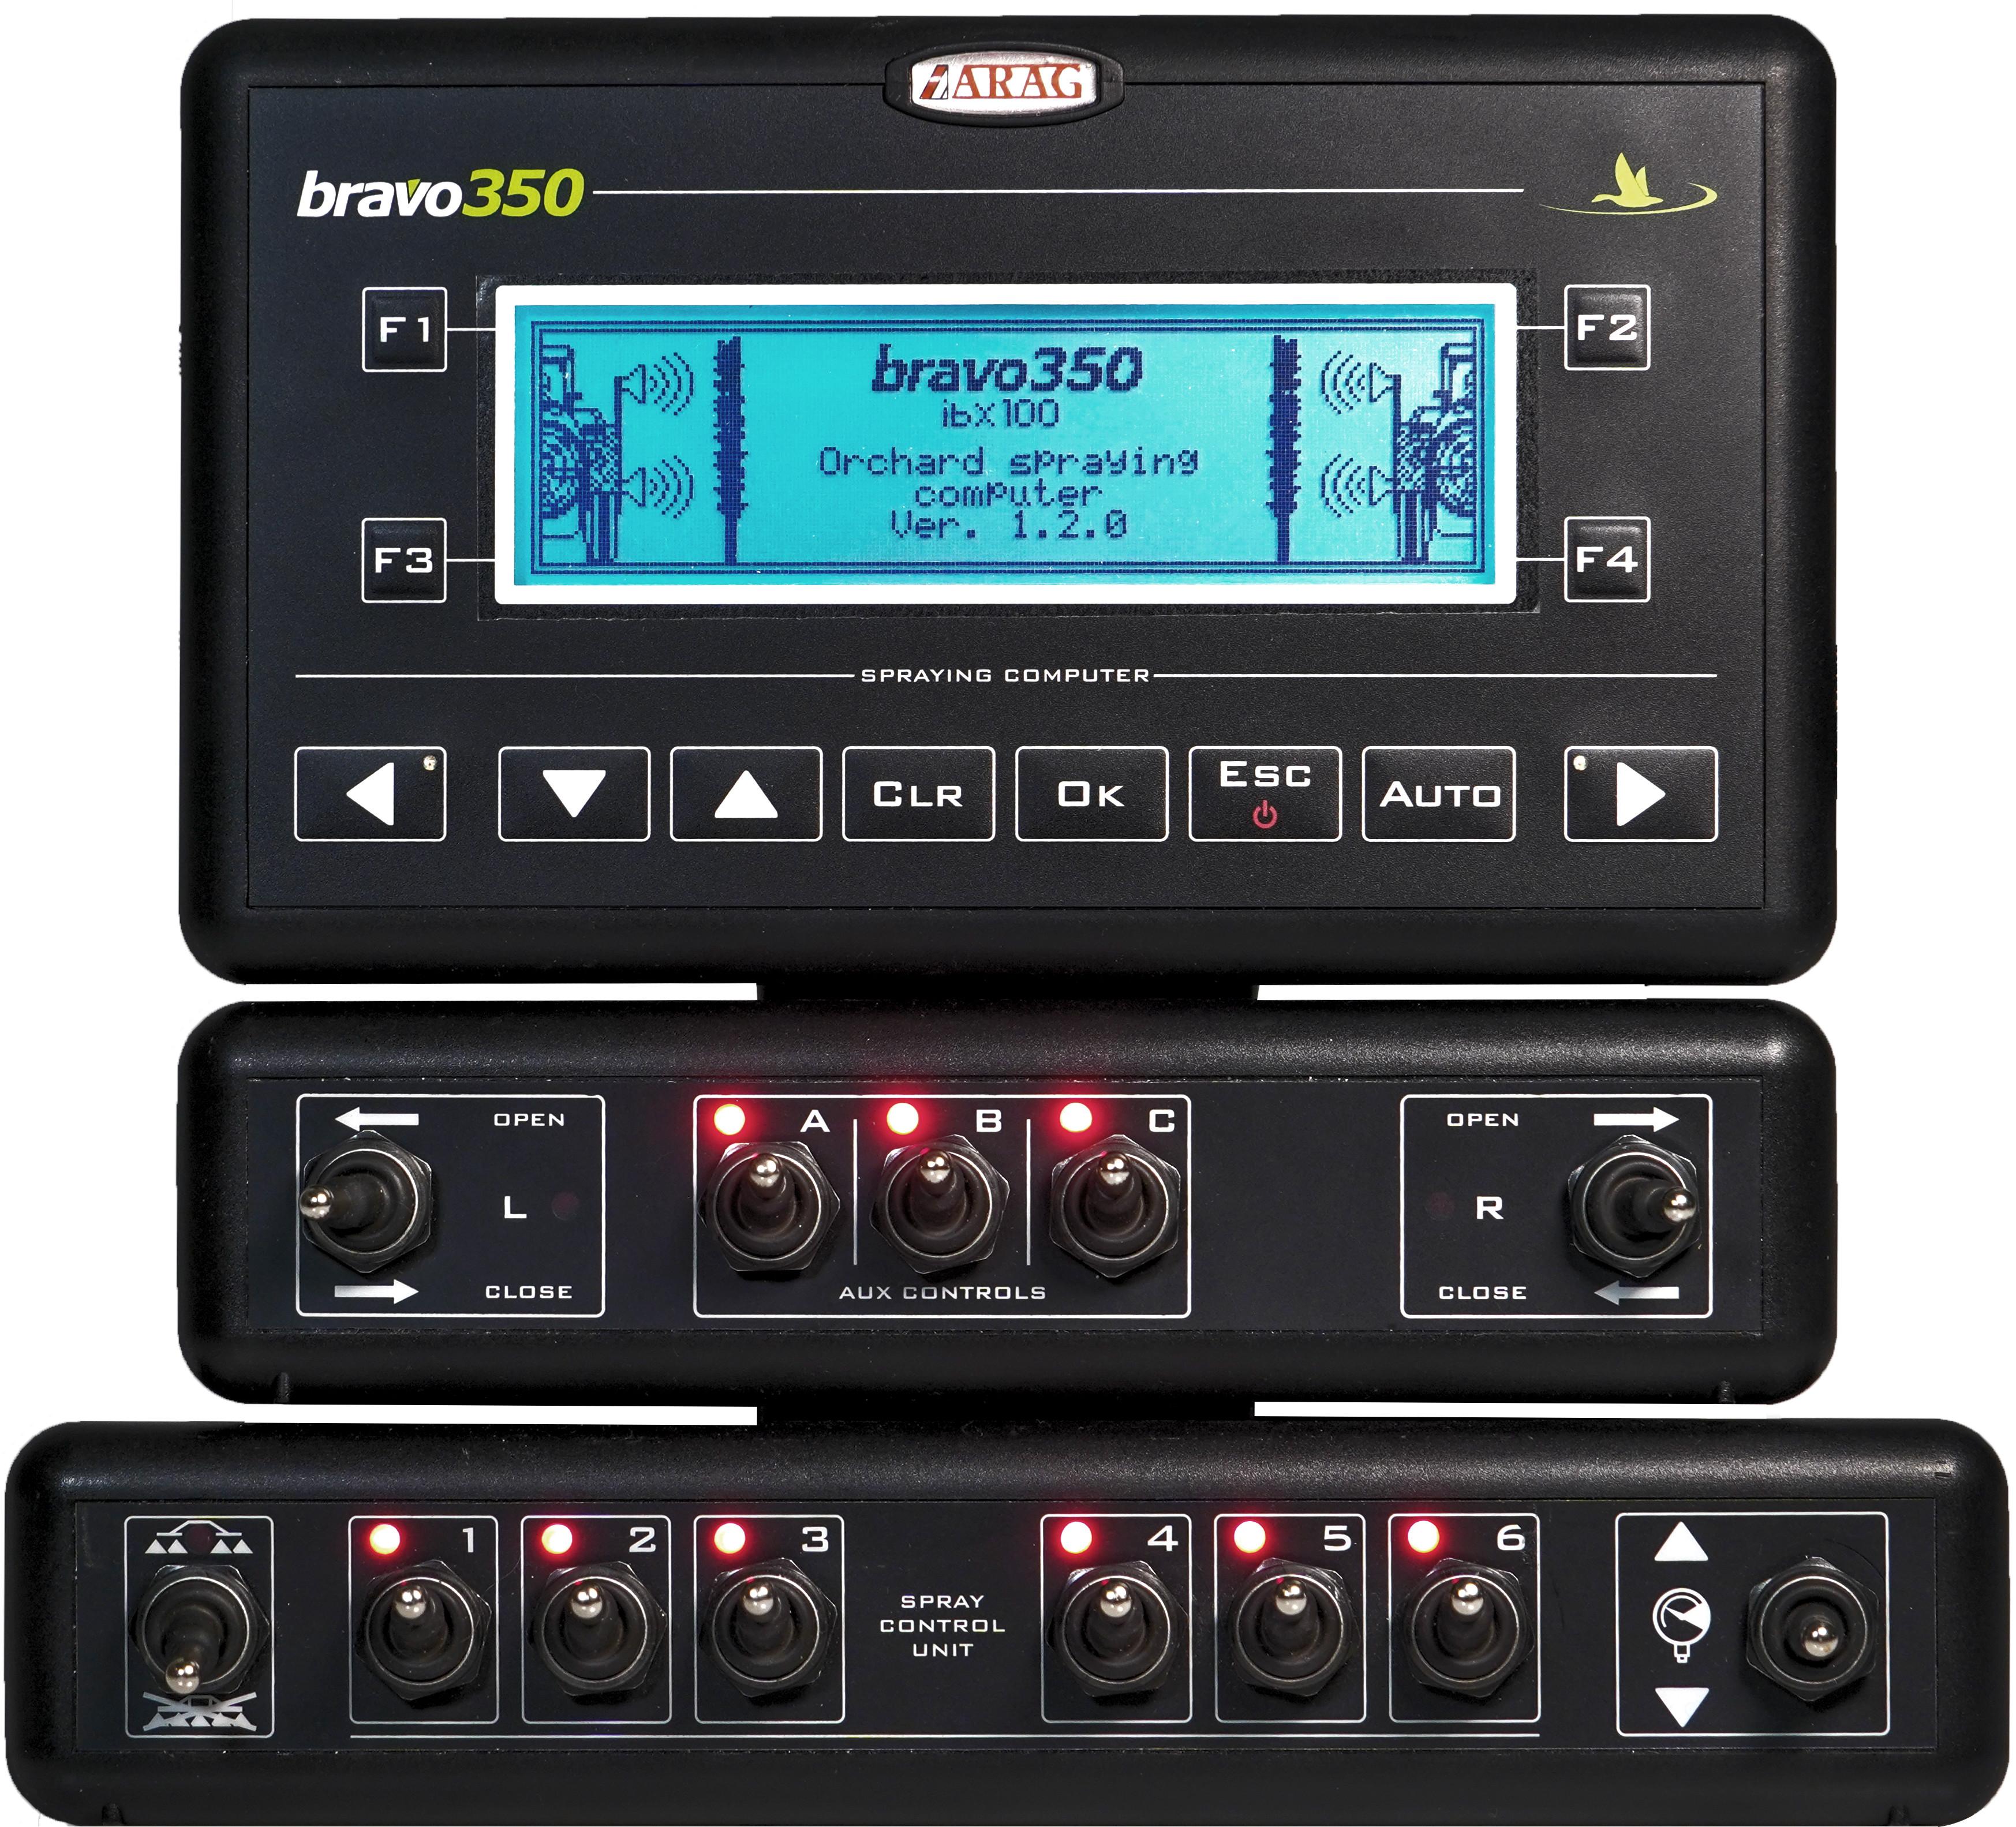 Bravo 350